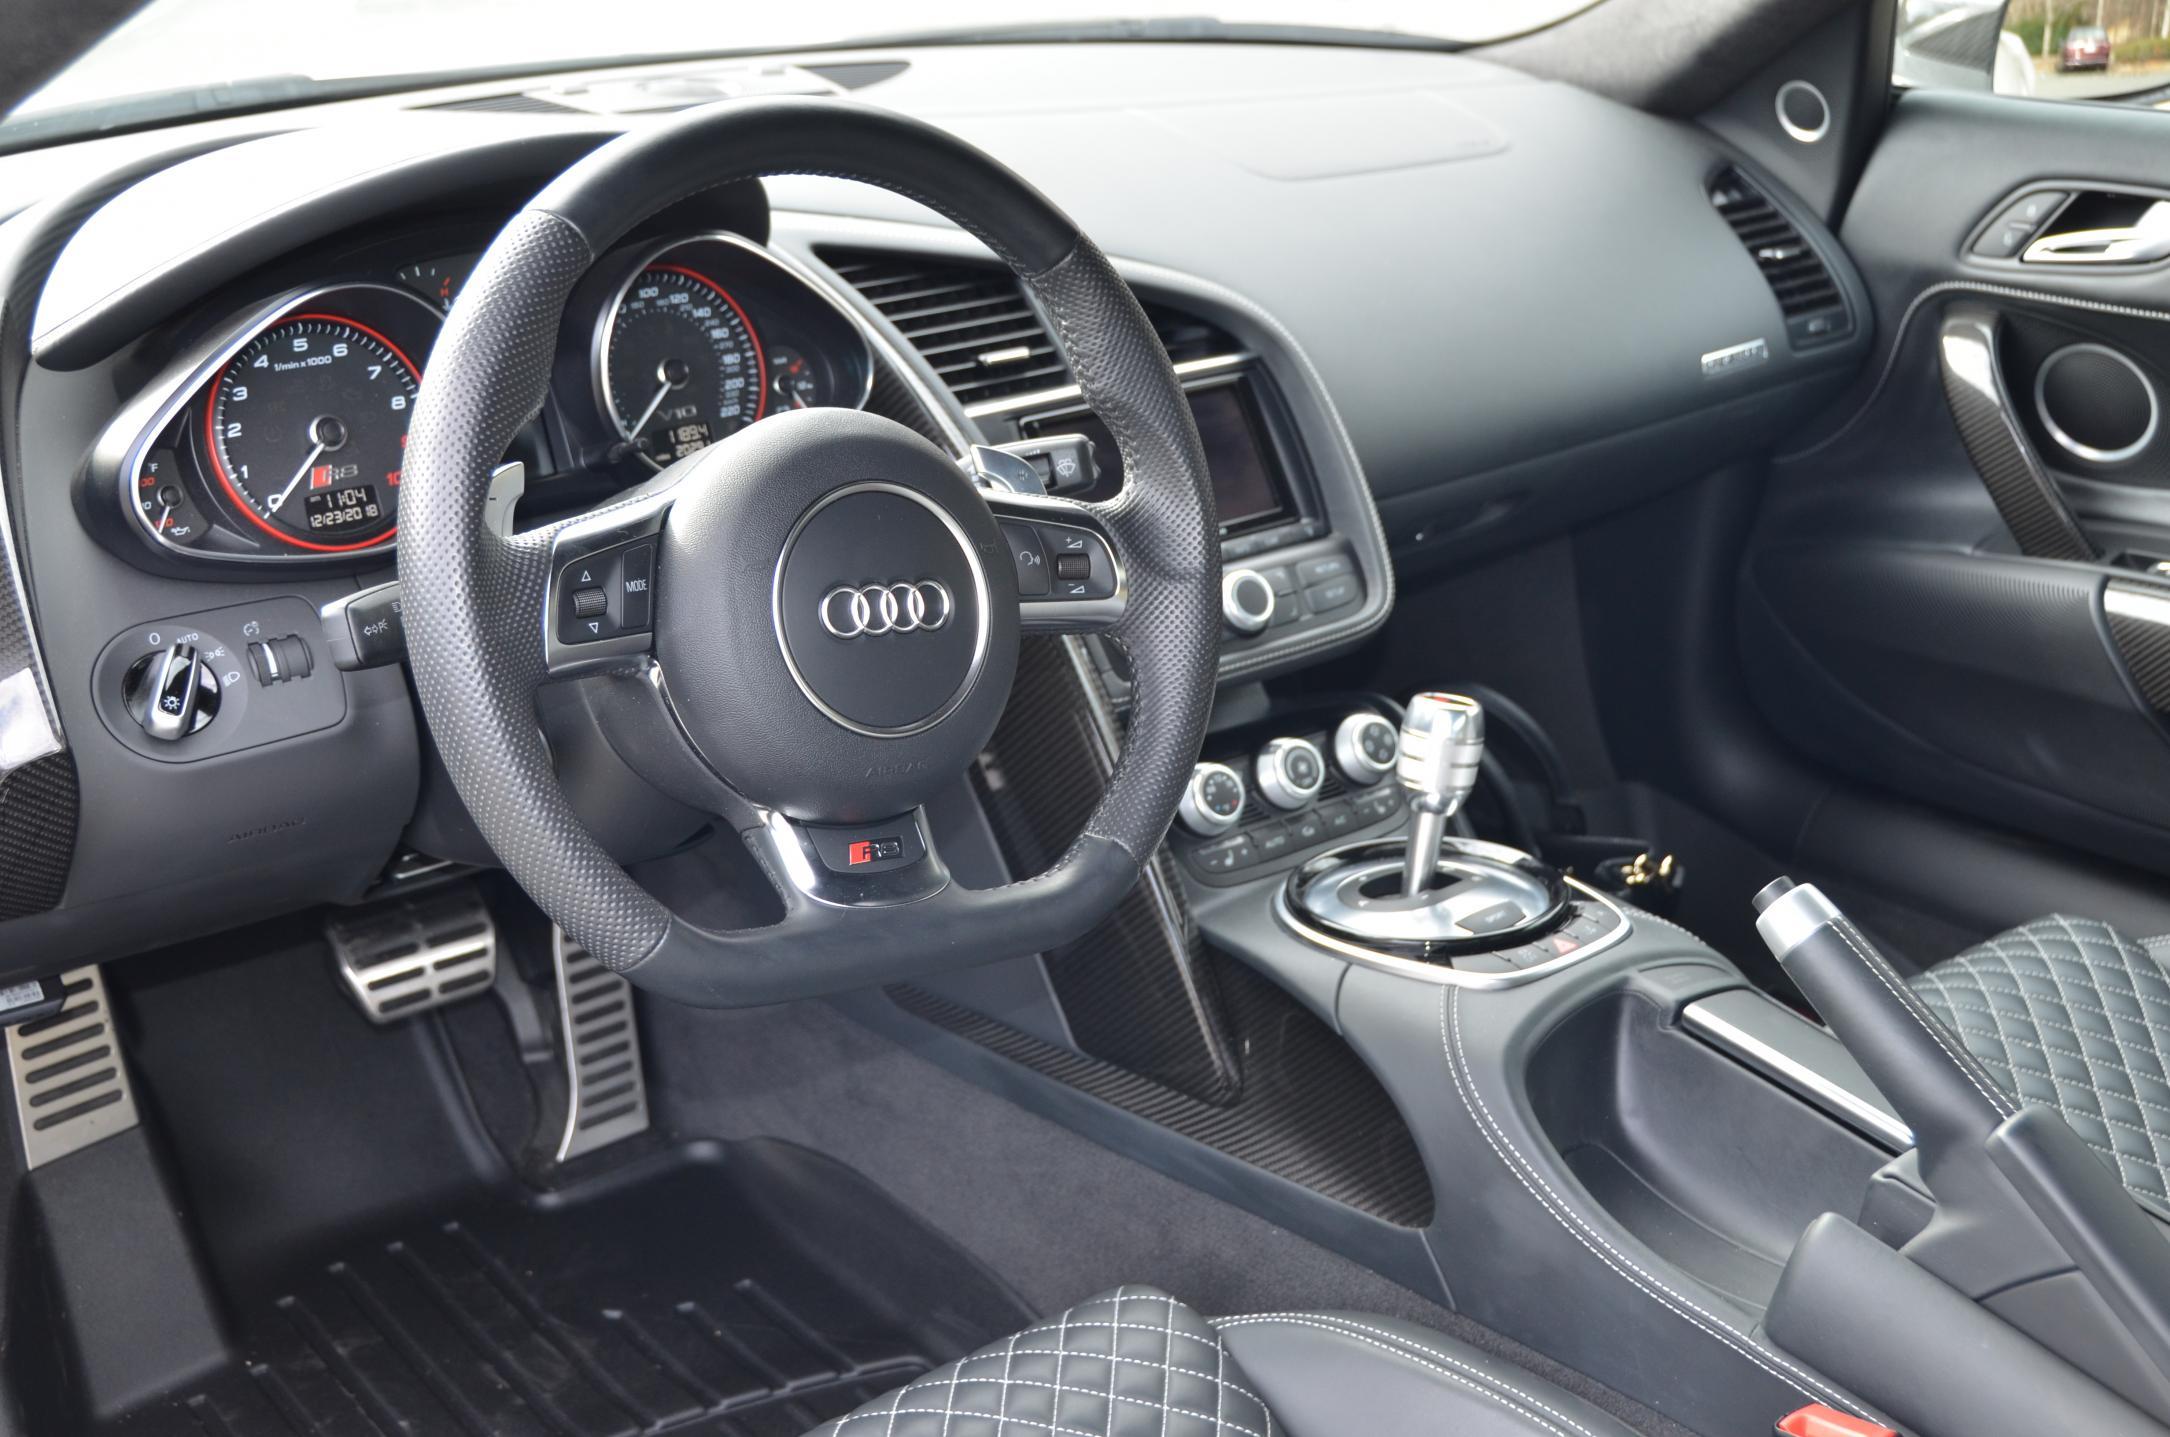 2015 Audi R8 V10+, S-Tronic, Ti exhaust, Fidelity Platinum 4/48